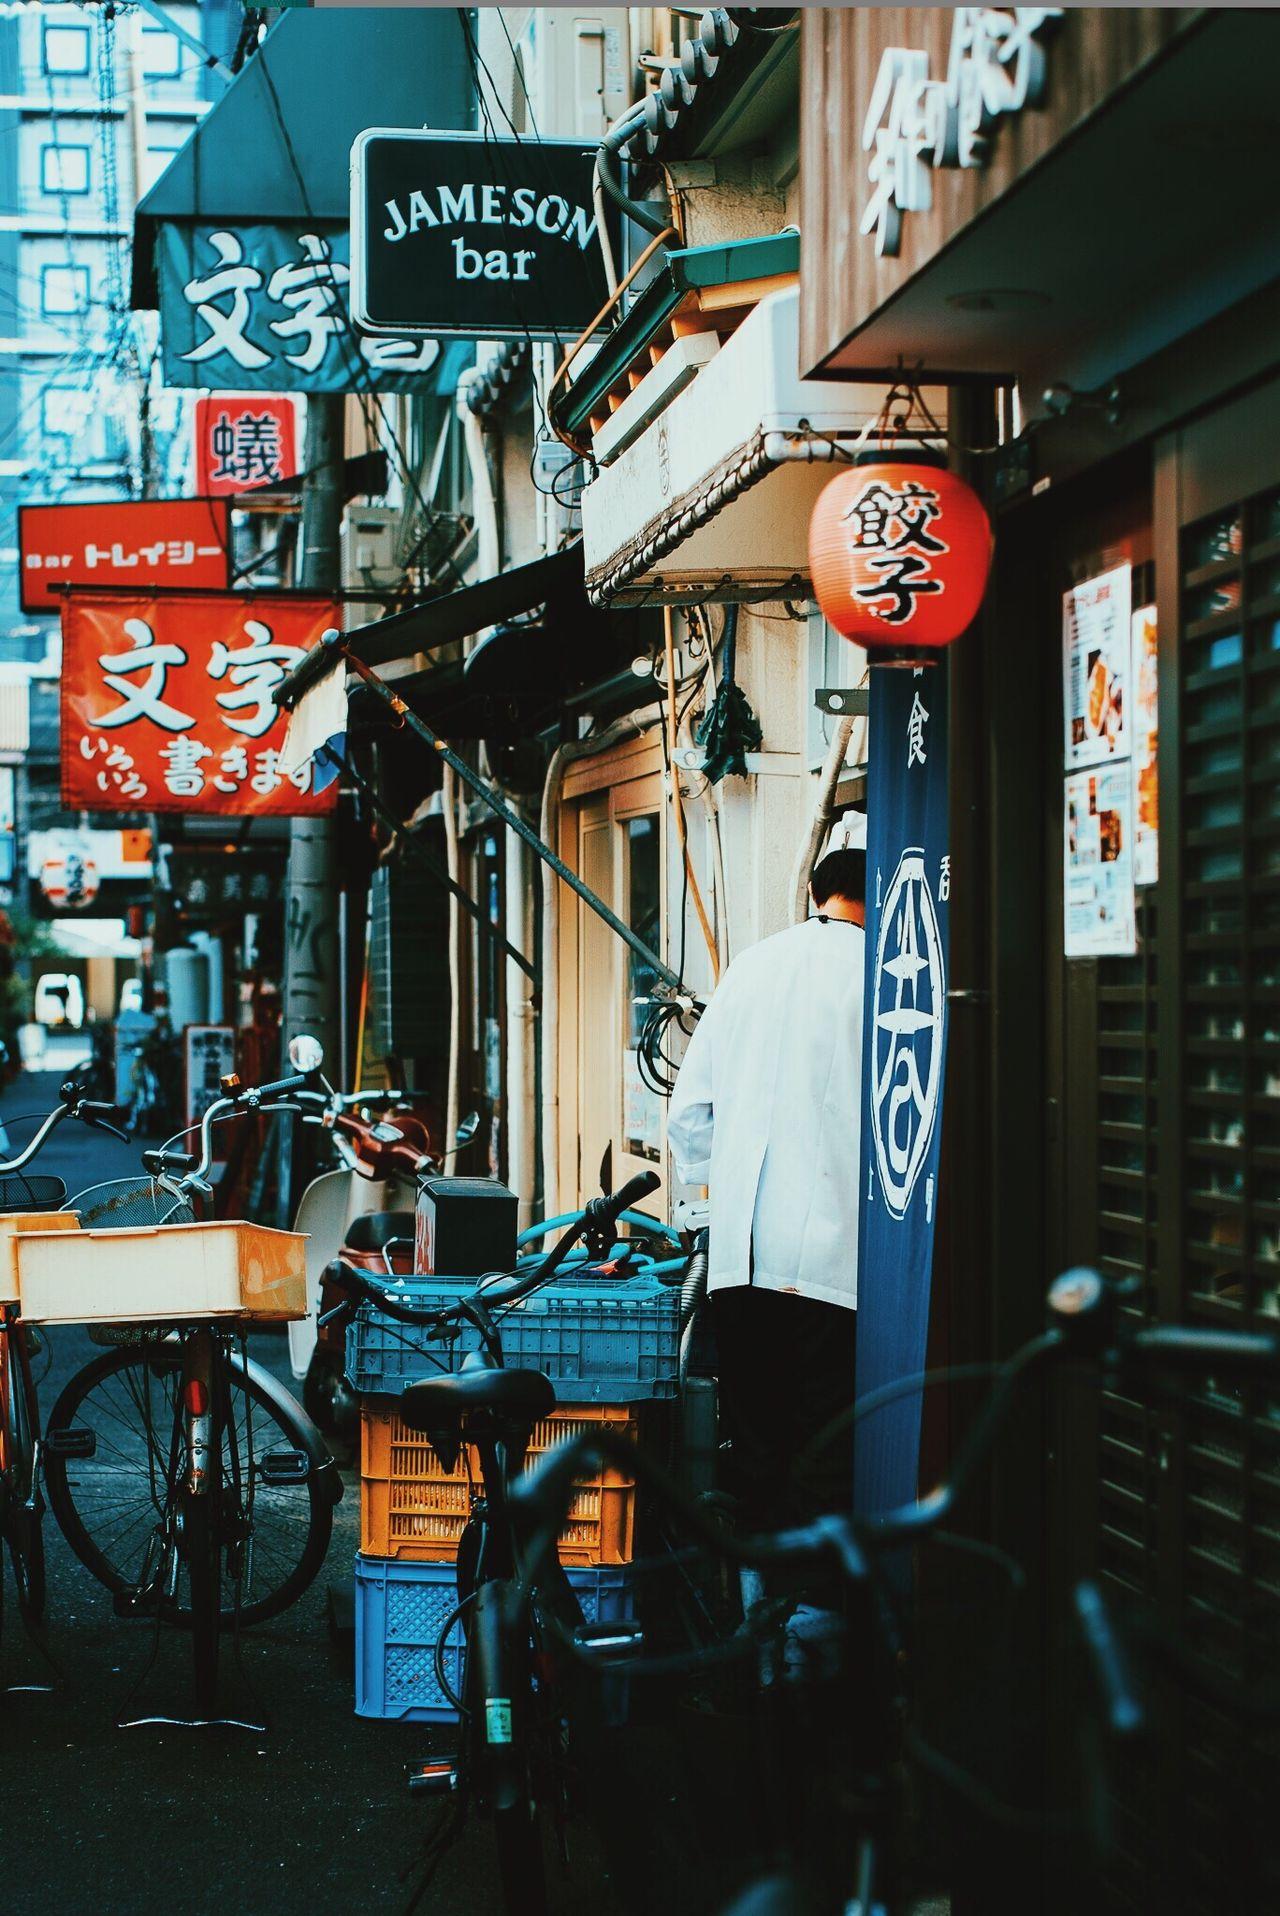 Building Exterior Outdoors City Alley Bars And Restaurants Japan Osaka,Japan Bikes